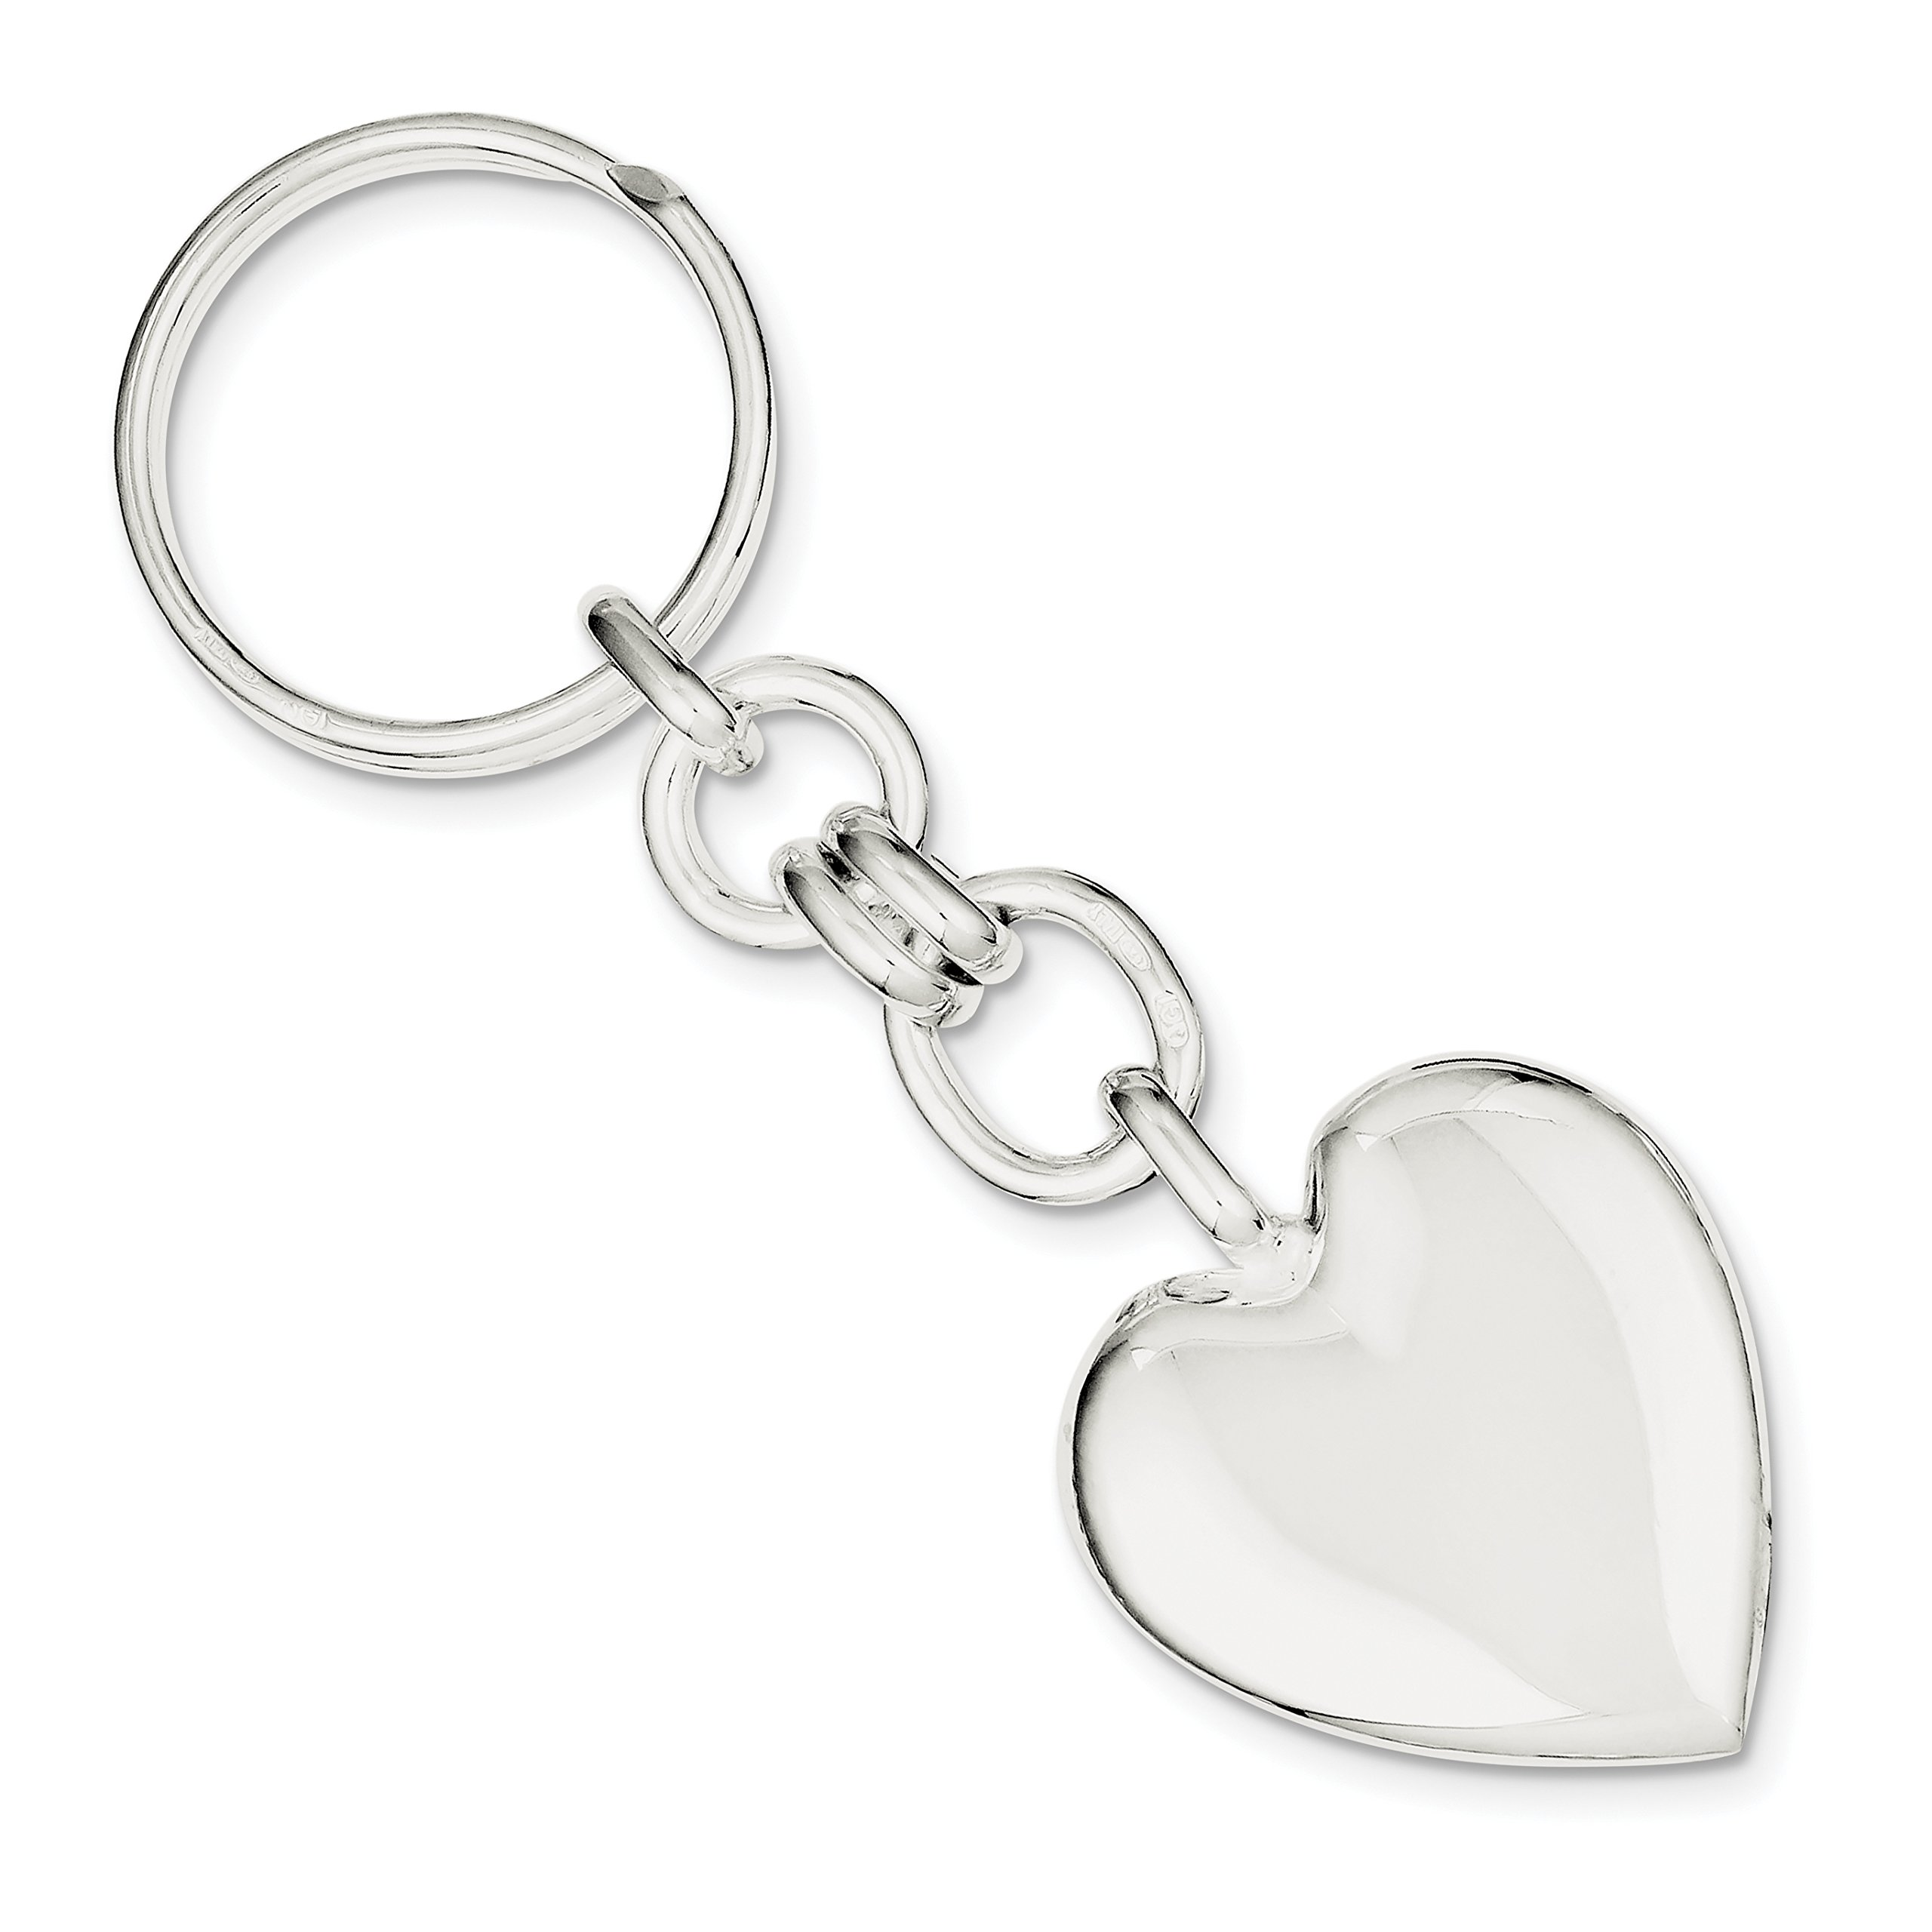 925 Sterling Silver Heart Key Ring by Diamond2Deal